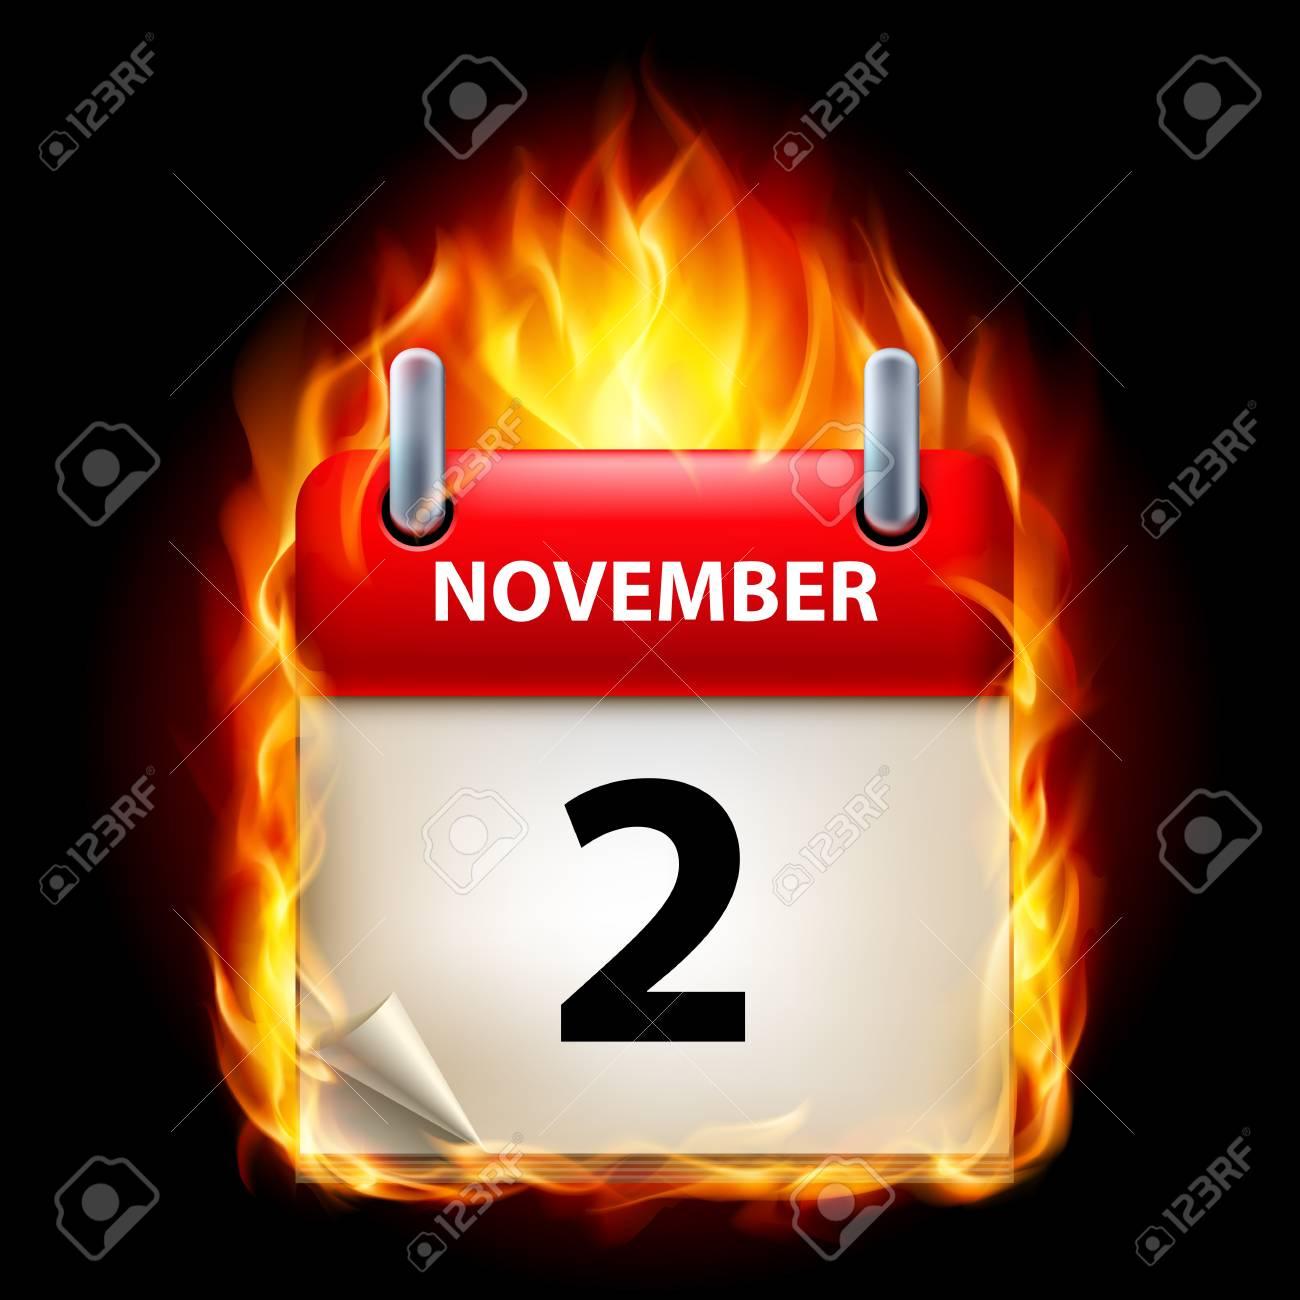 Second November in Calendar. Burning Icon on black background Stock Vector - 15097782